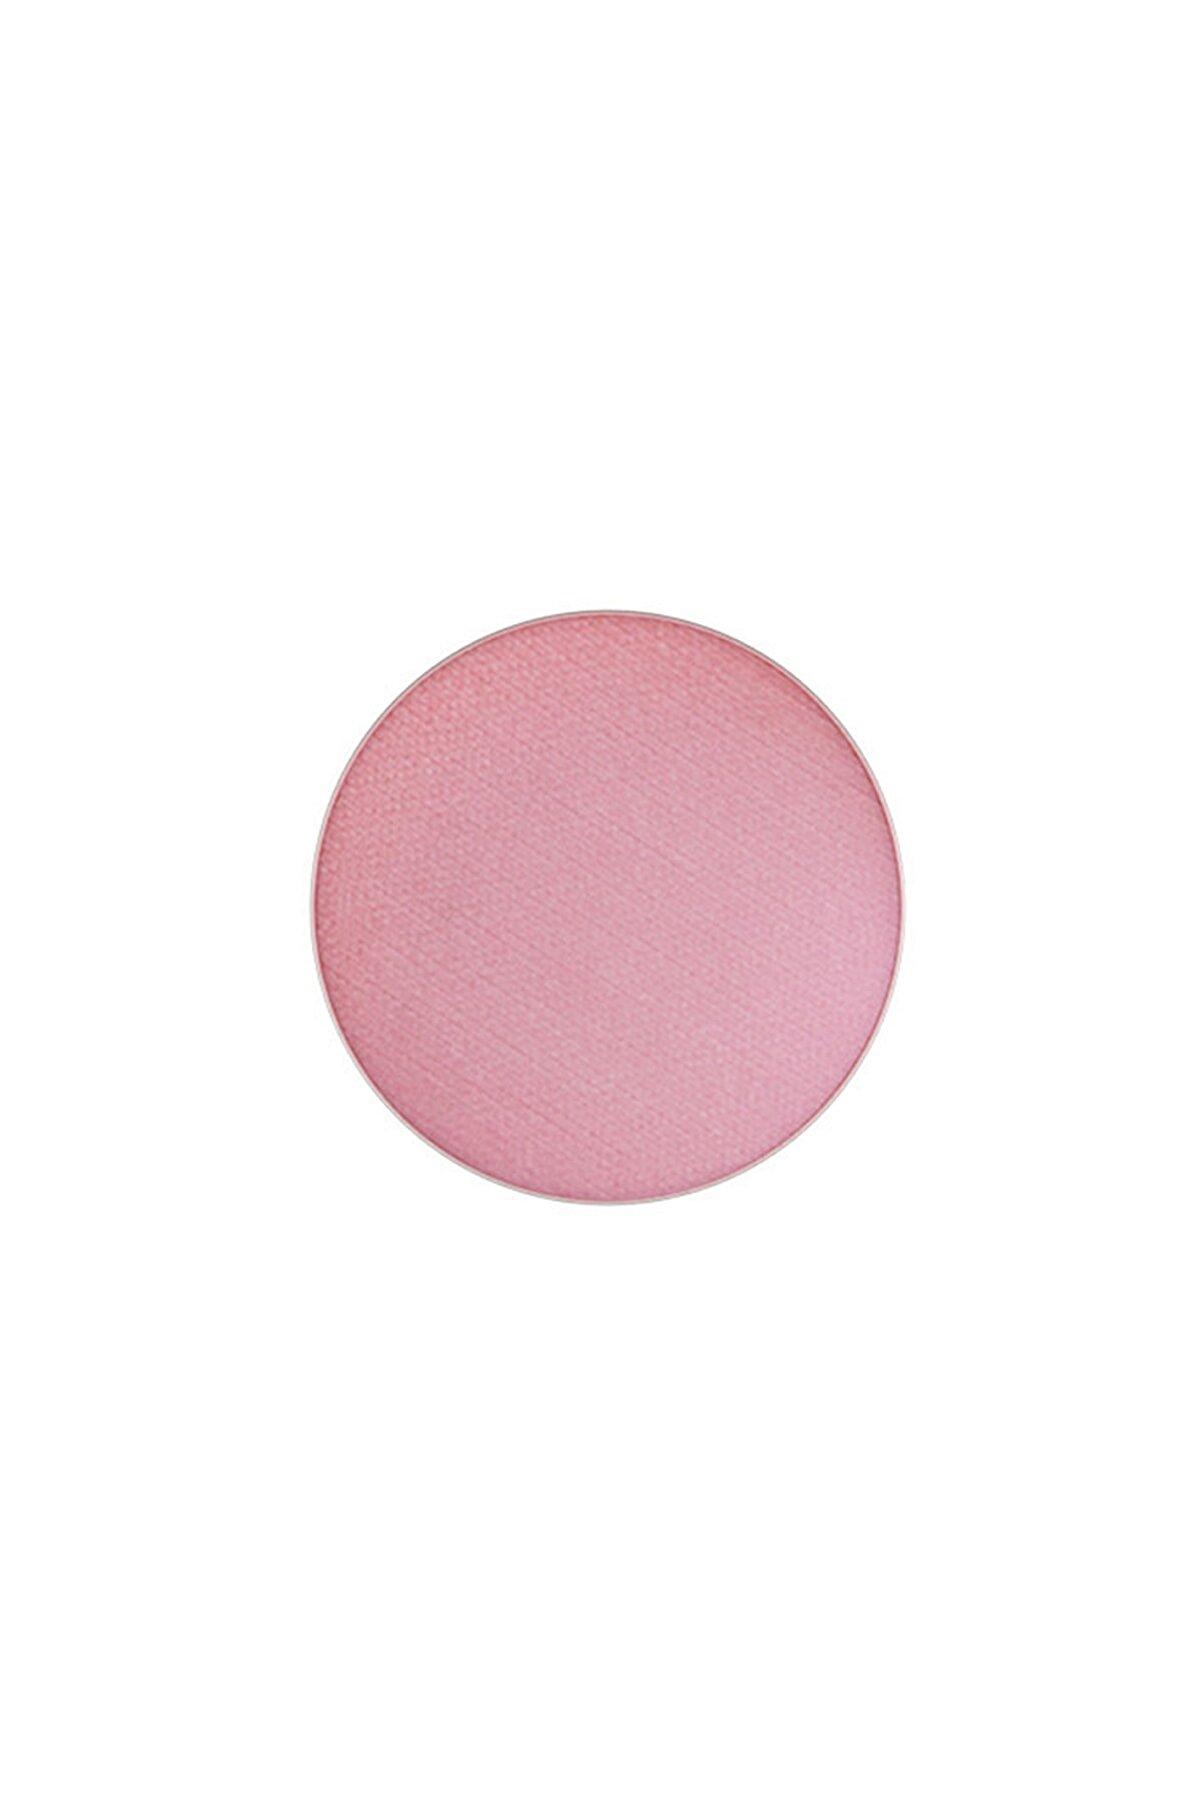 Mac Göz Farı - Refill Far Girlie 1.5 g 773602962778